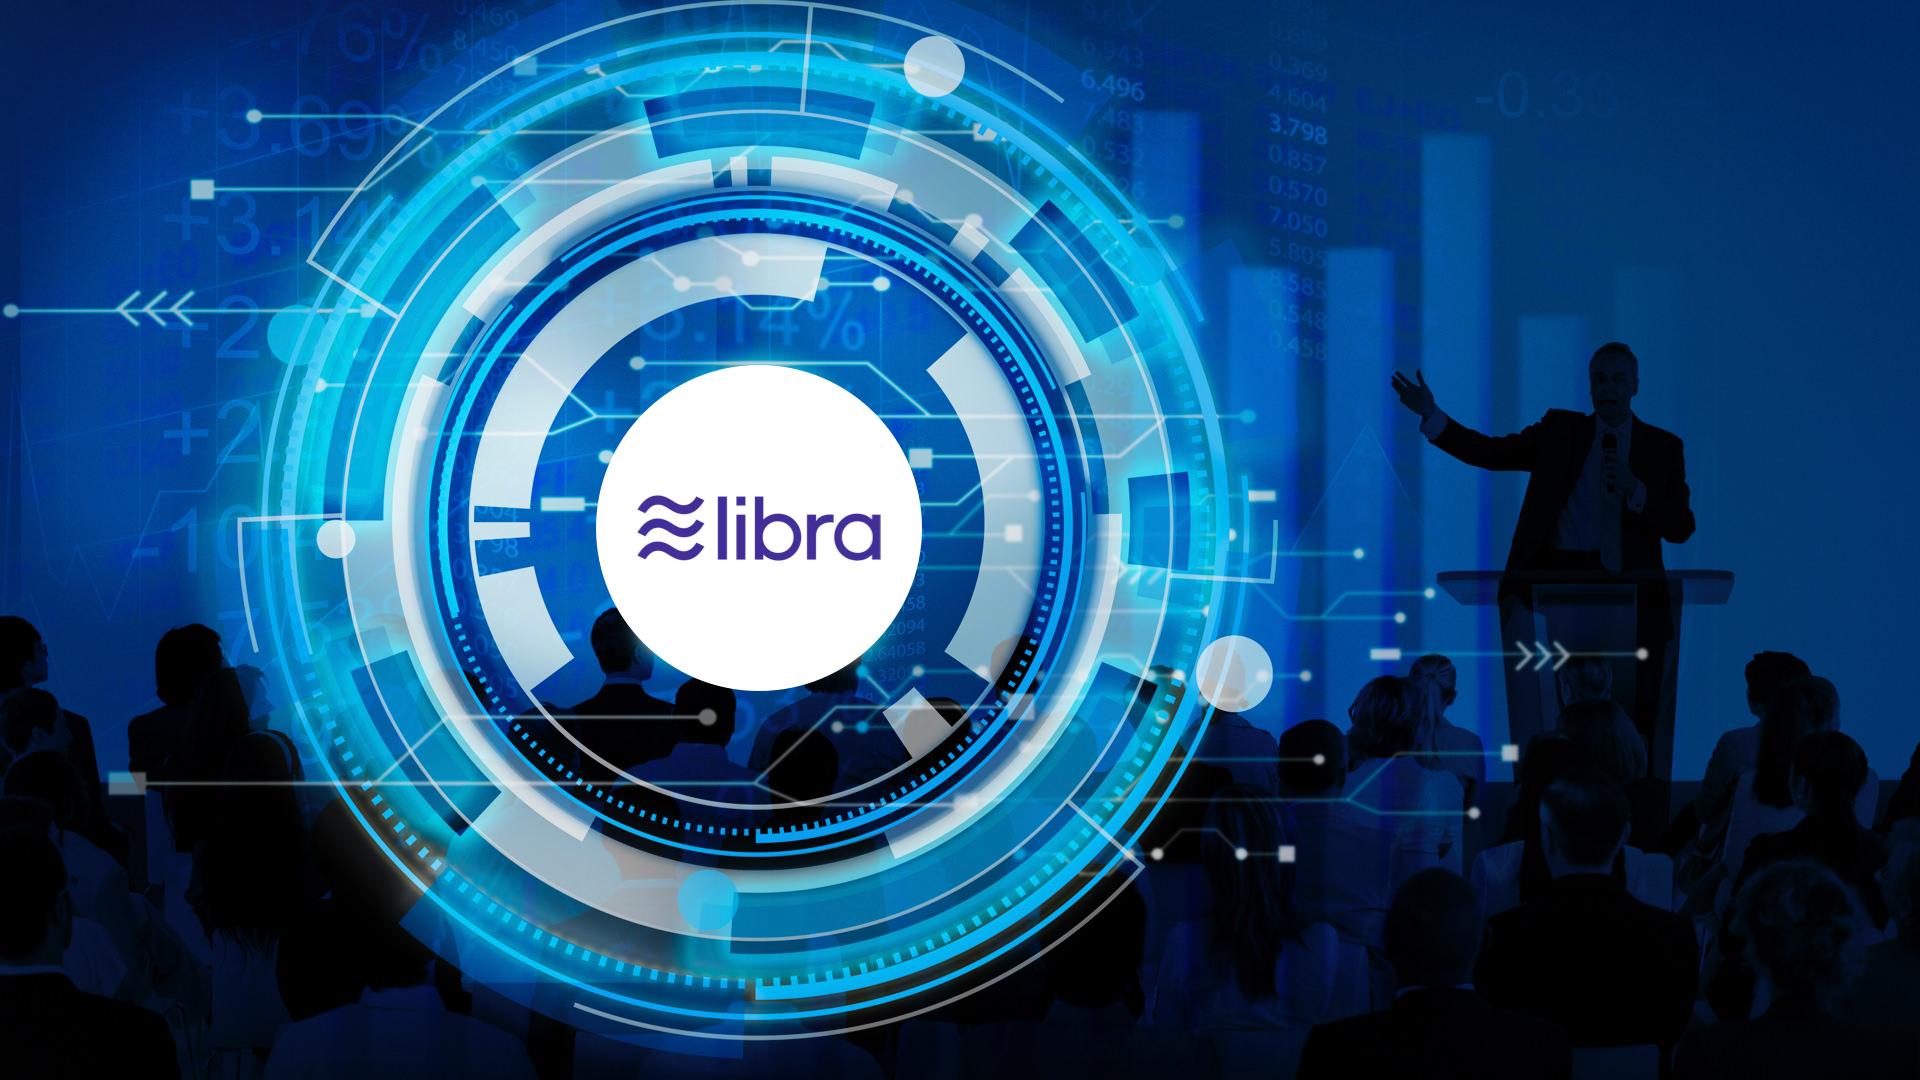 Libra : A Financial Game Changer